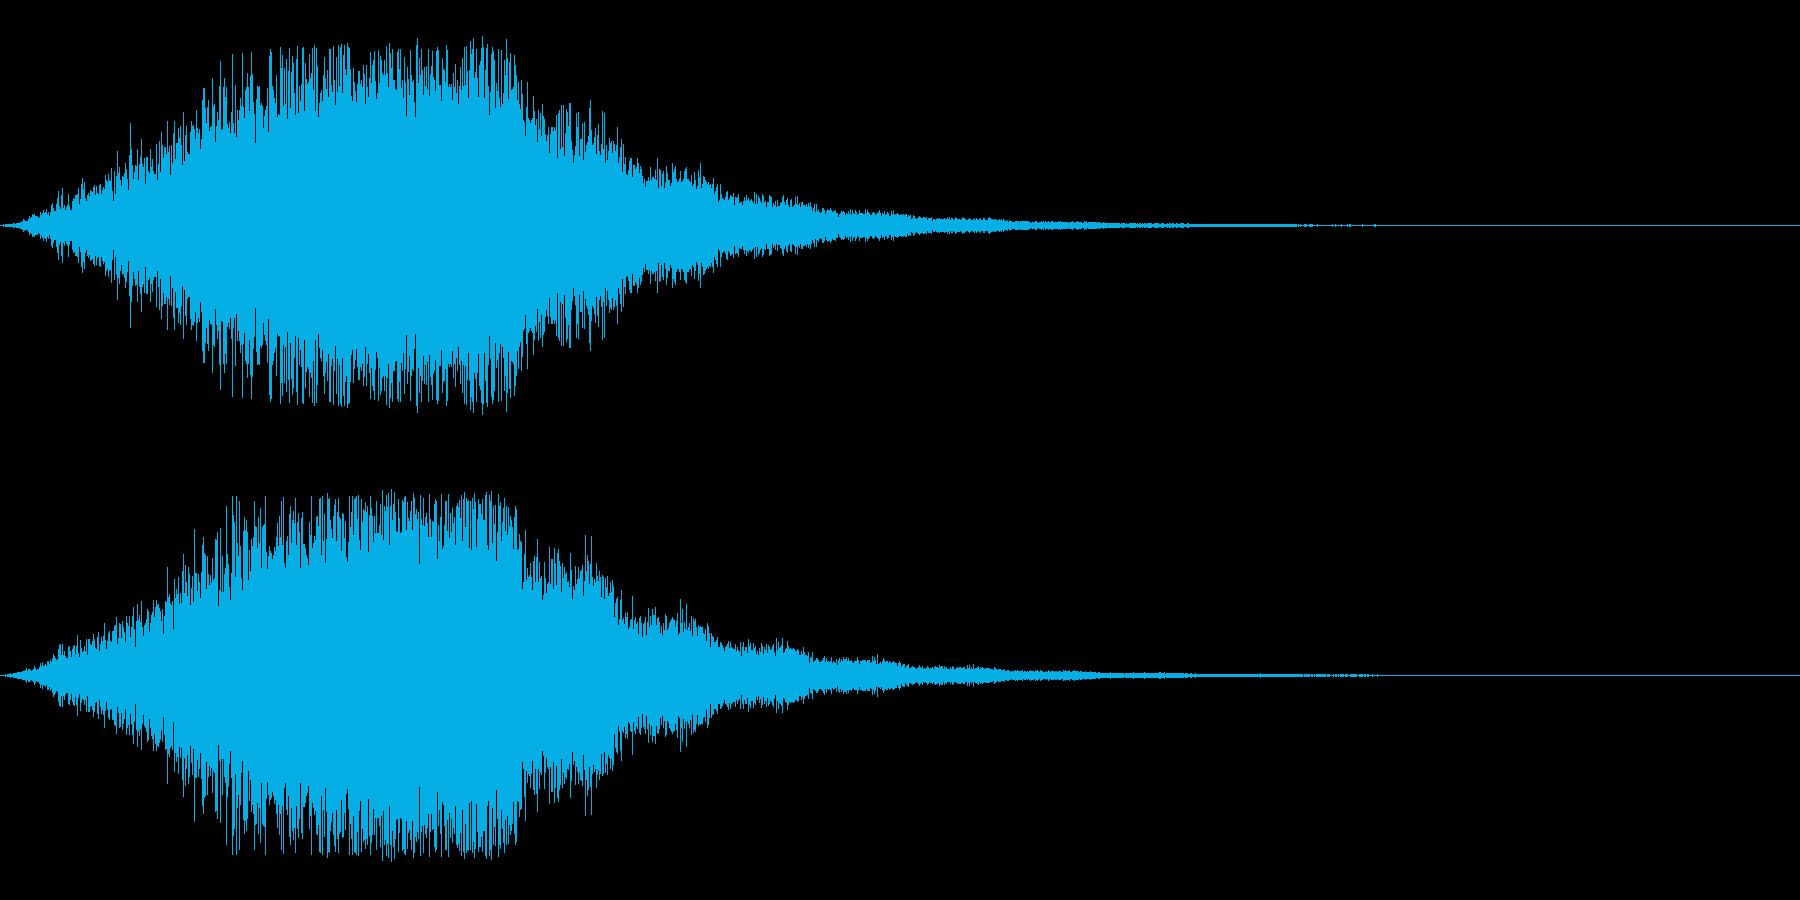 Dark_Reverse-11delayの再生済みの波形